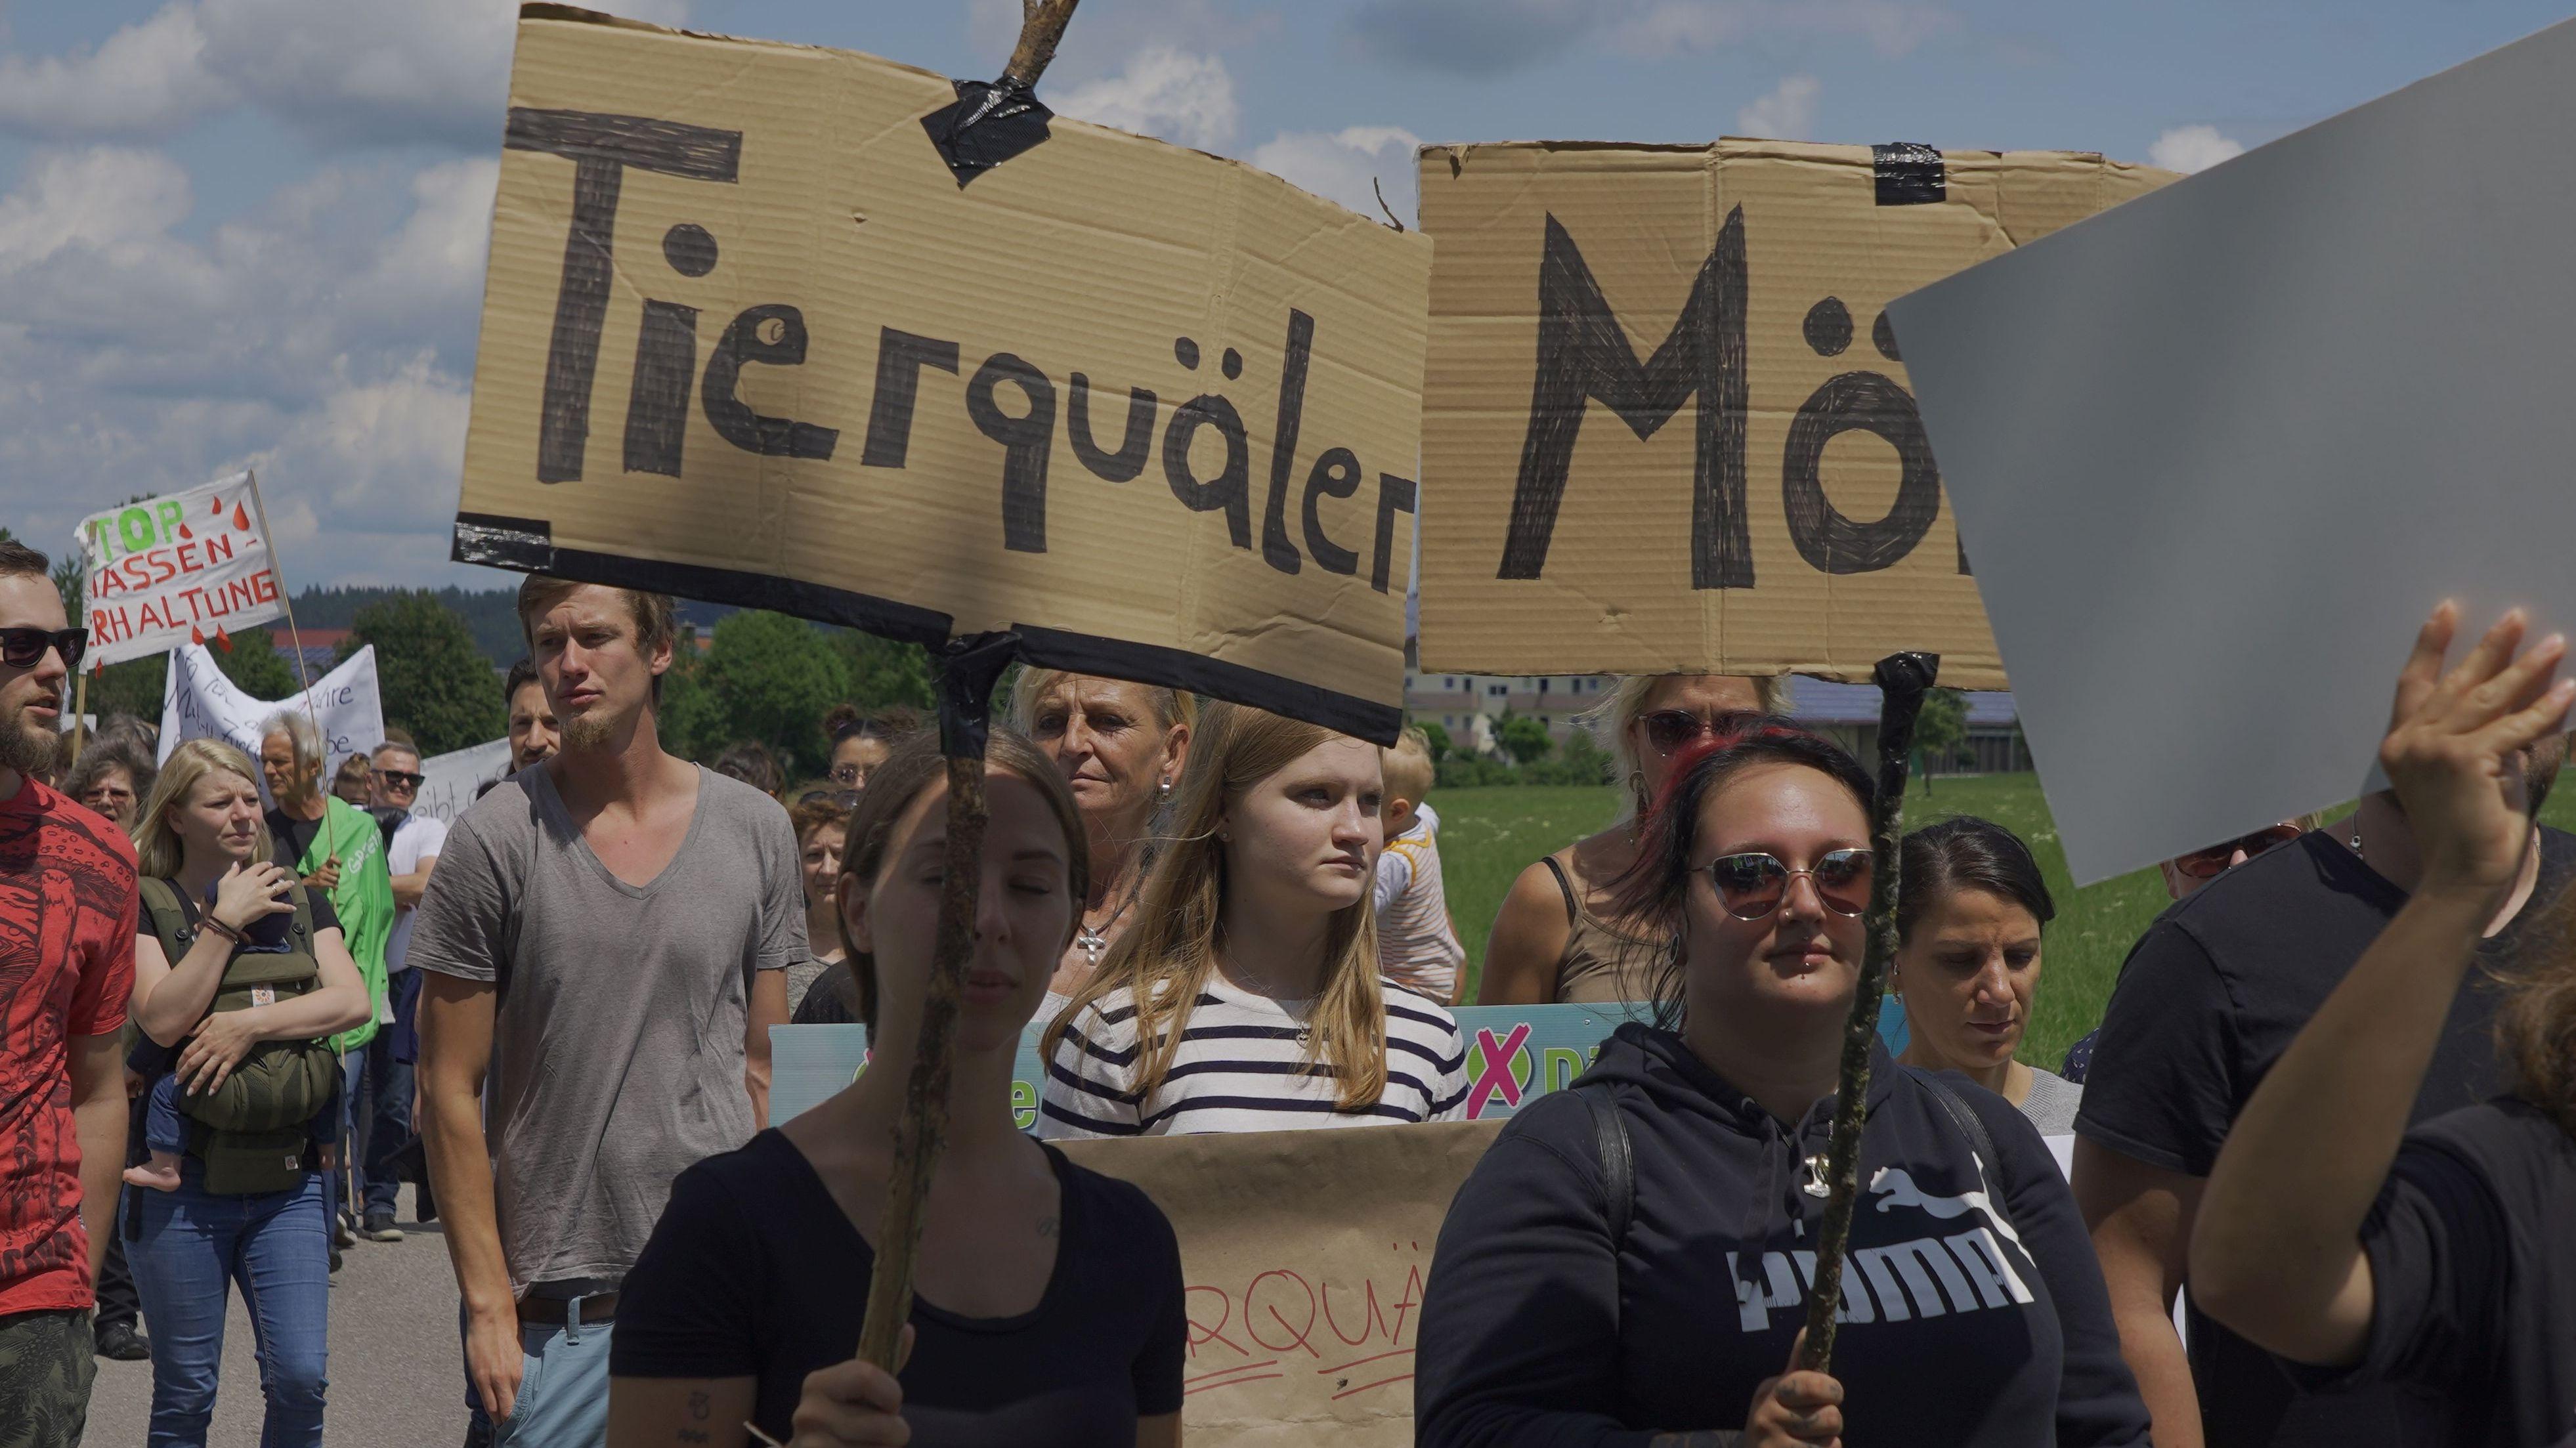 Tierschutz-Demonstranten laufen in Richtung Großbetrieb Endres